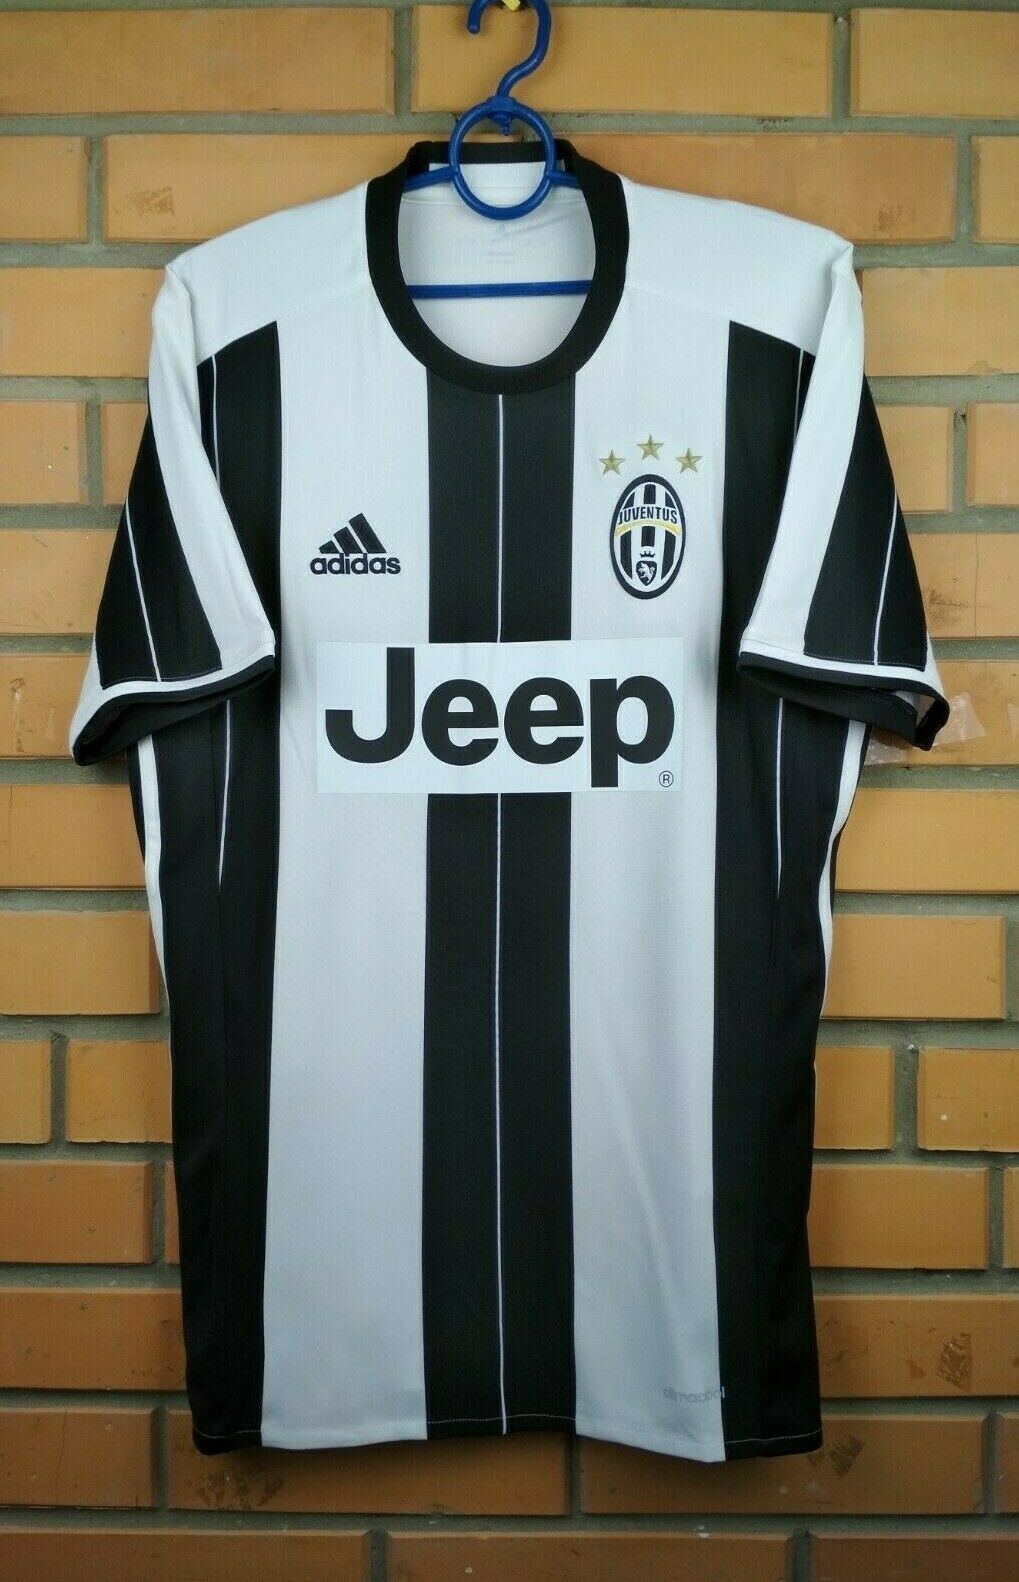 612dcf9ec72 Juventus jersey small 2016 2017 home shirt AI6241 soccer football Adidas